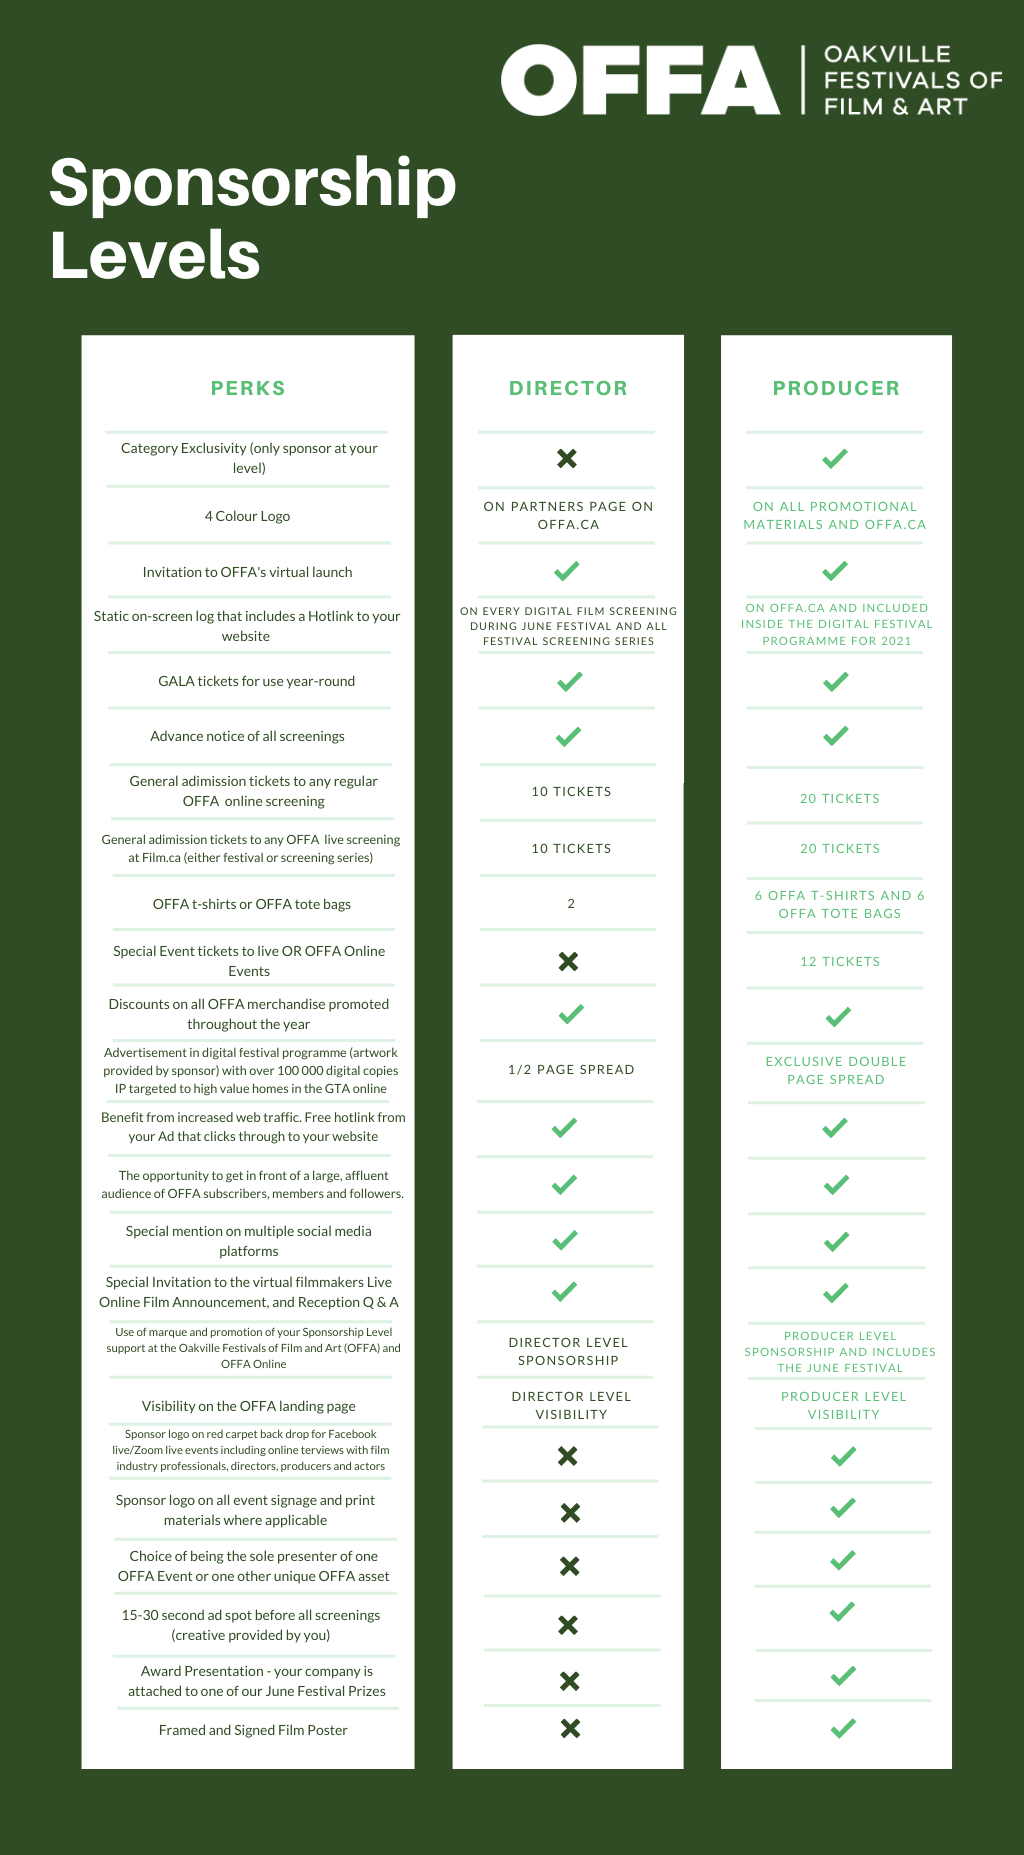 Sponsorship Comparison Chart - Director vs Producer Level